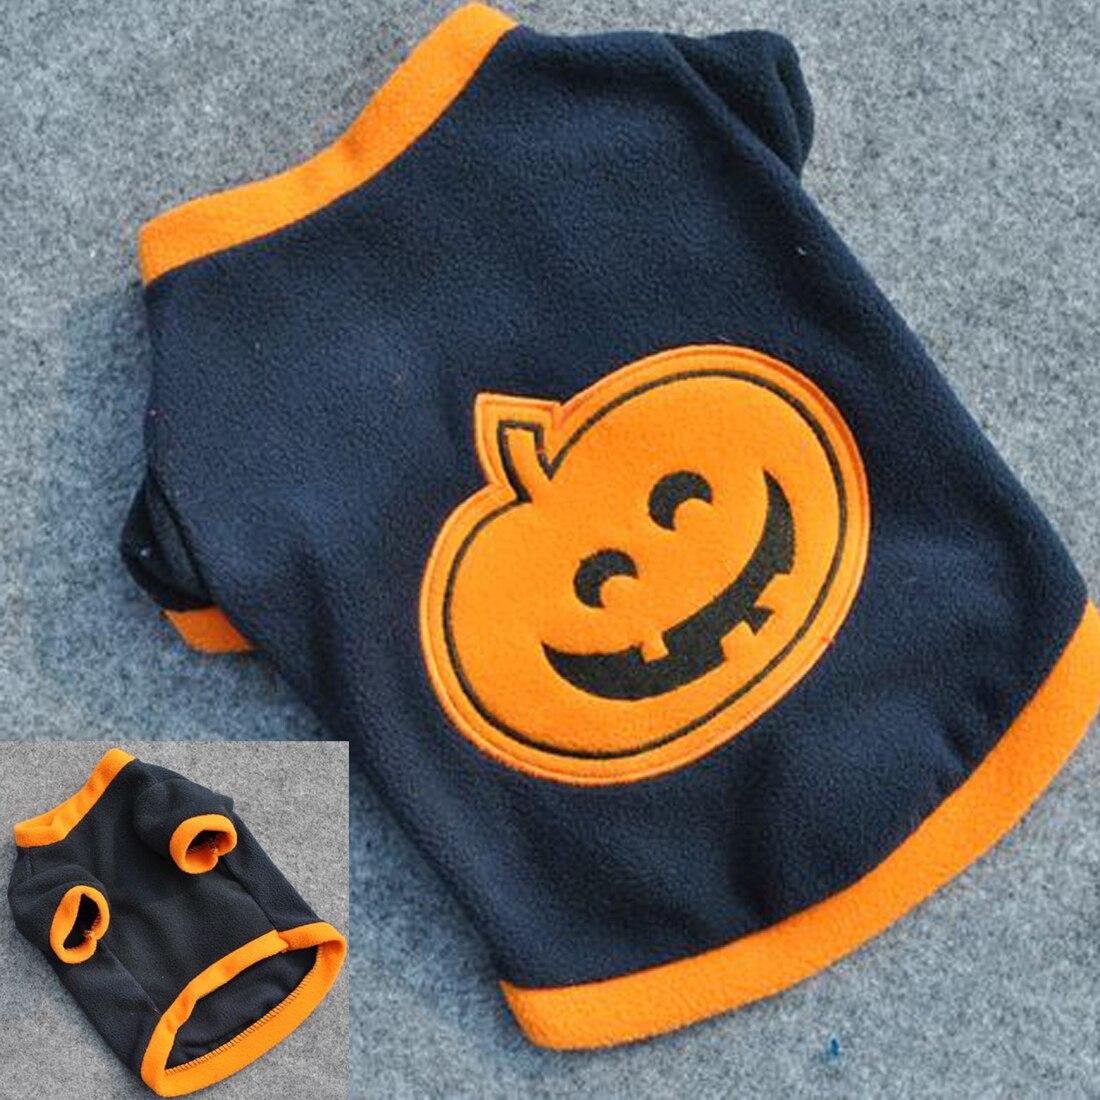 Low sale Orange Dog Puppy T-Shirts Clothes Warm Fleeces Cute Pumpkin Halloween Costume